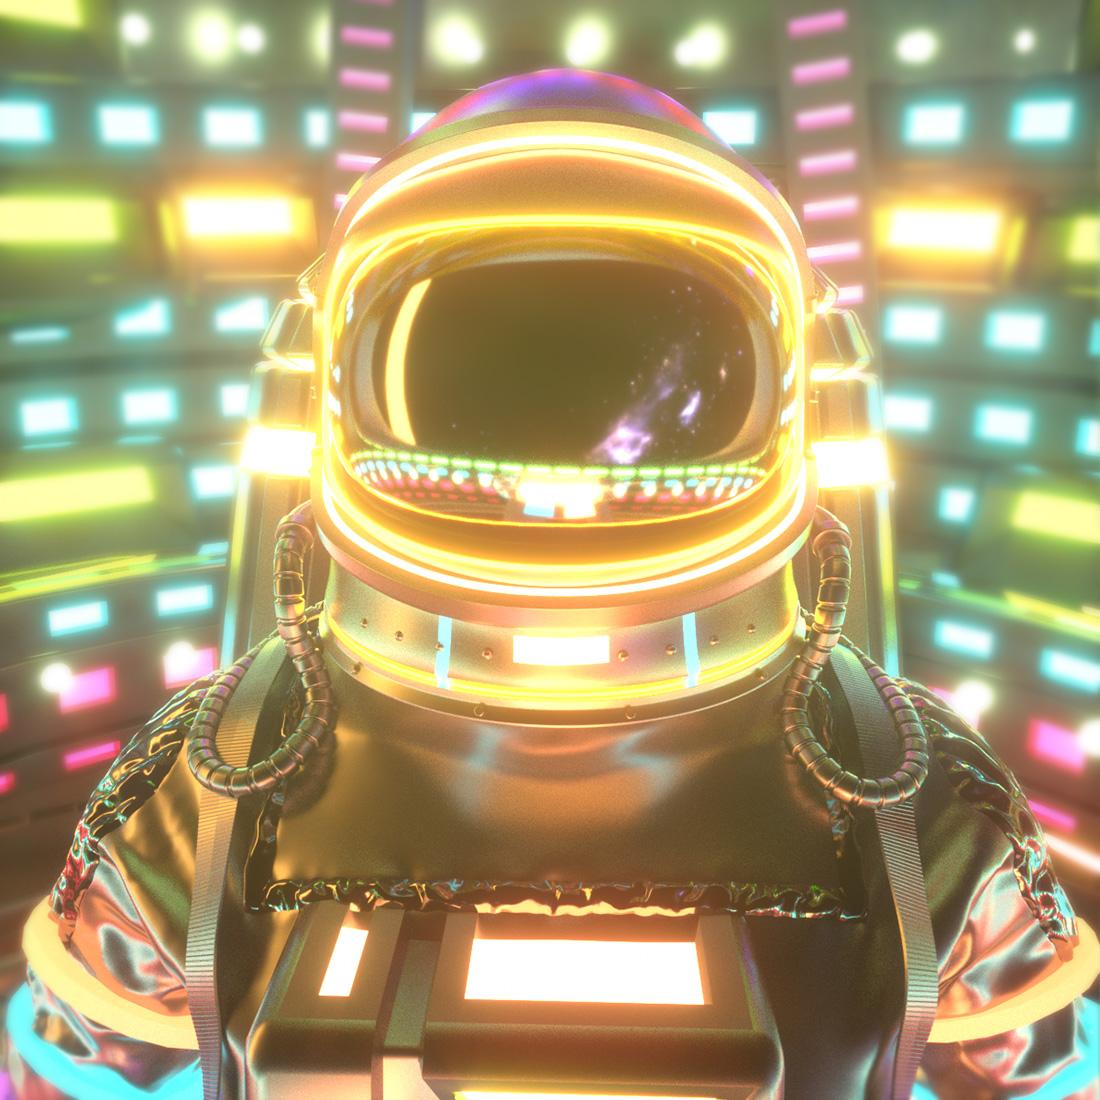 Astrohead_01_11_0090